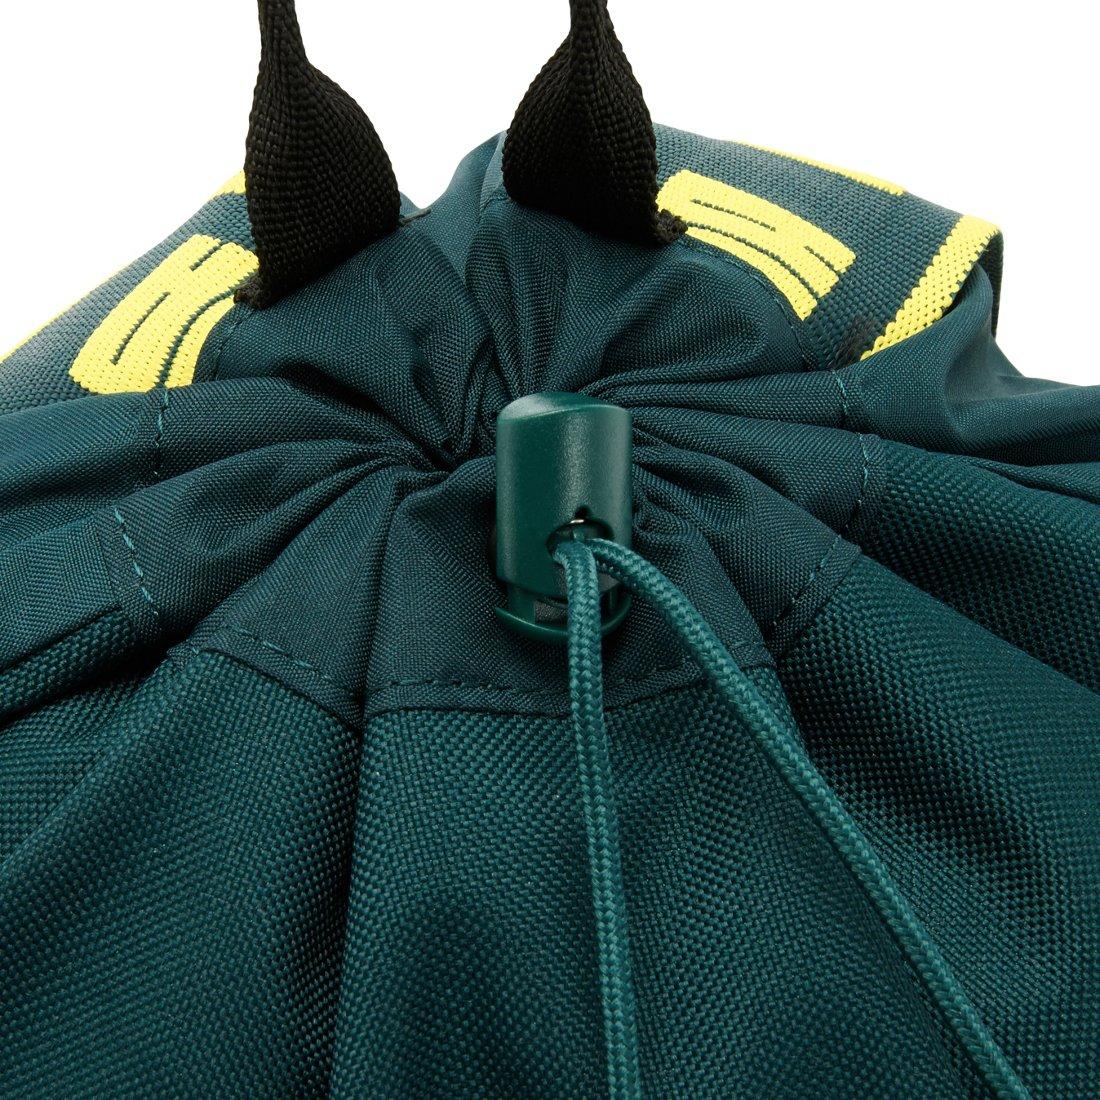 237739ccad5f6 Puma Sole Smart Bag Sportbeutel 48 cm - charcoal gray. Previous